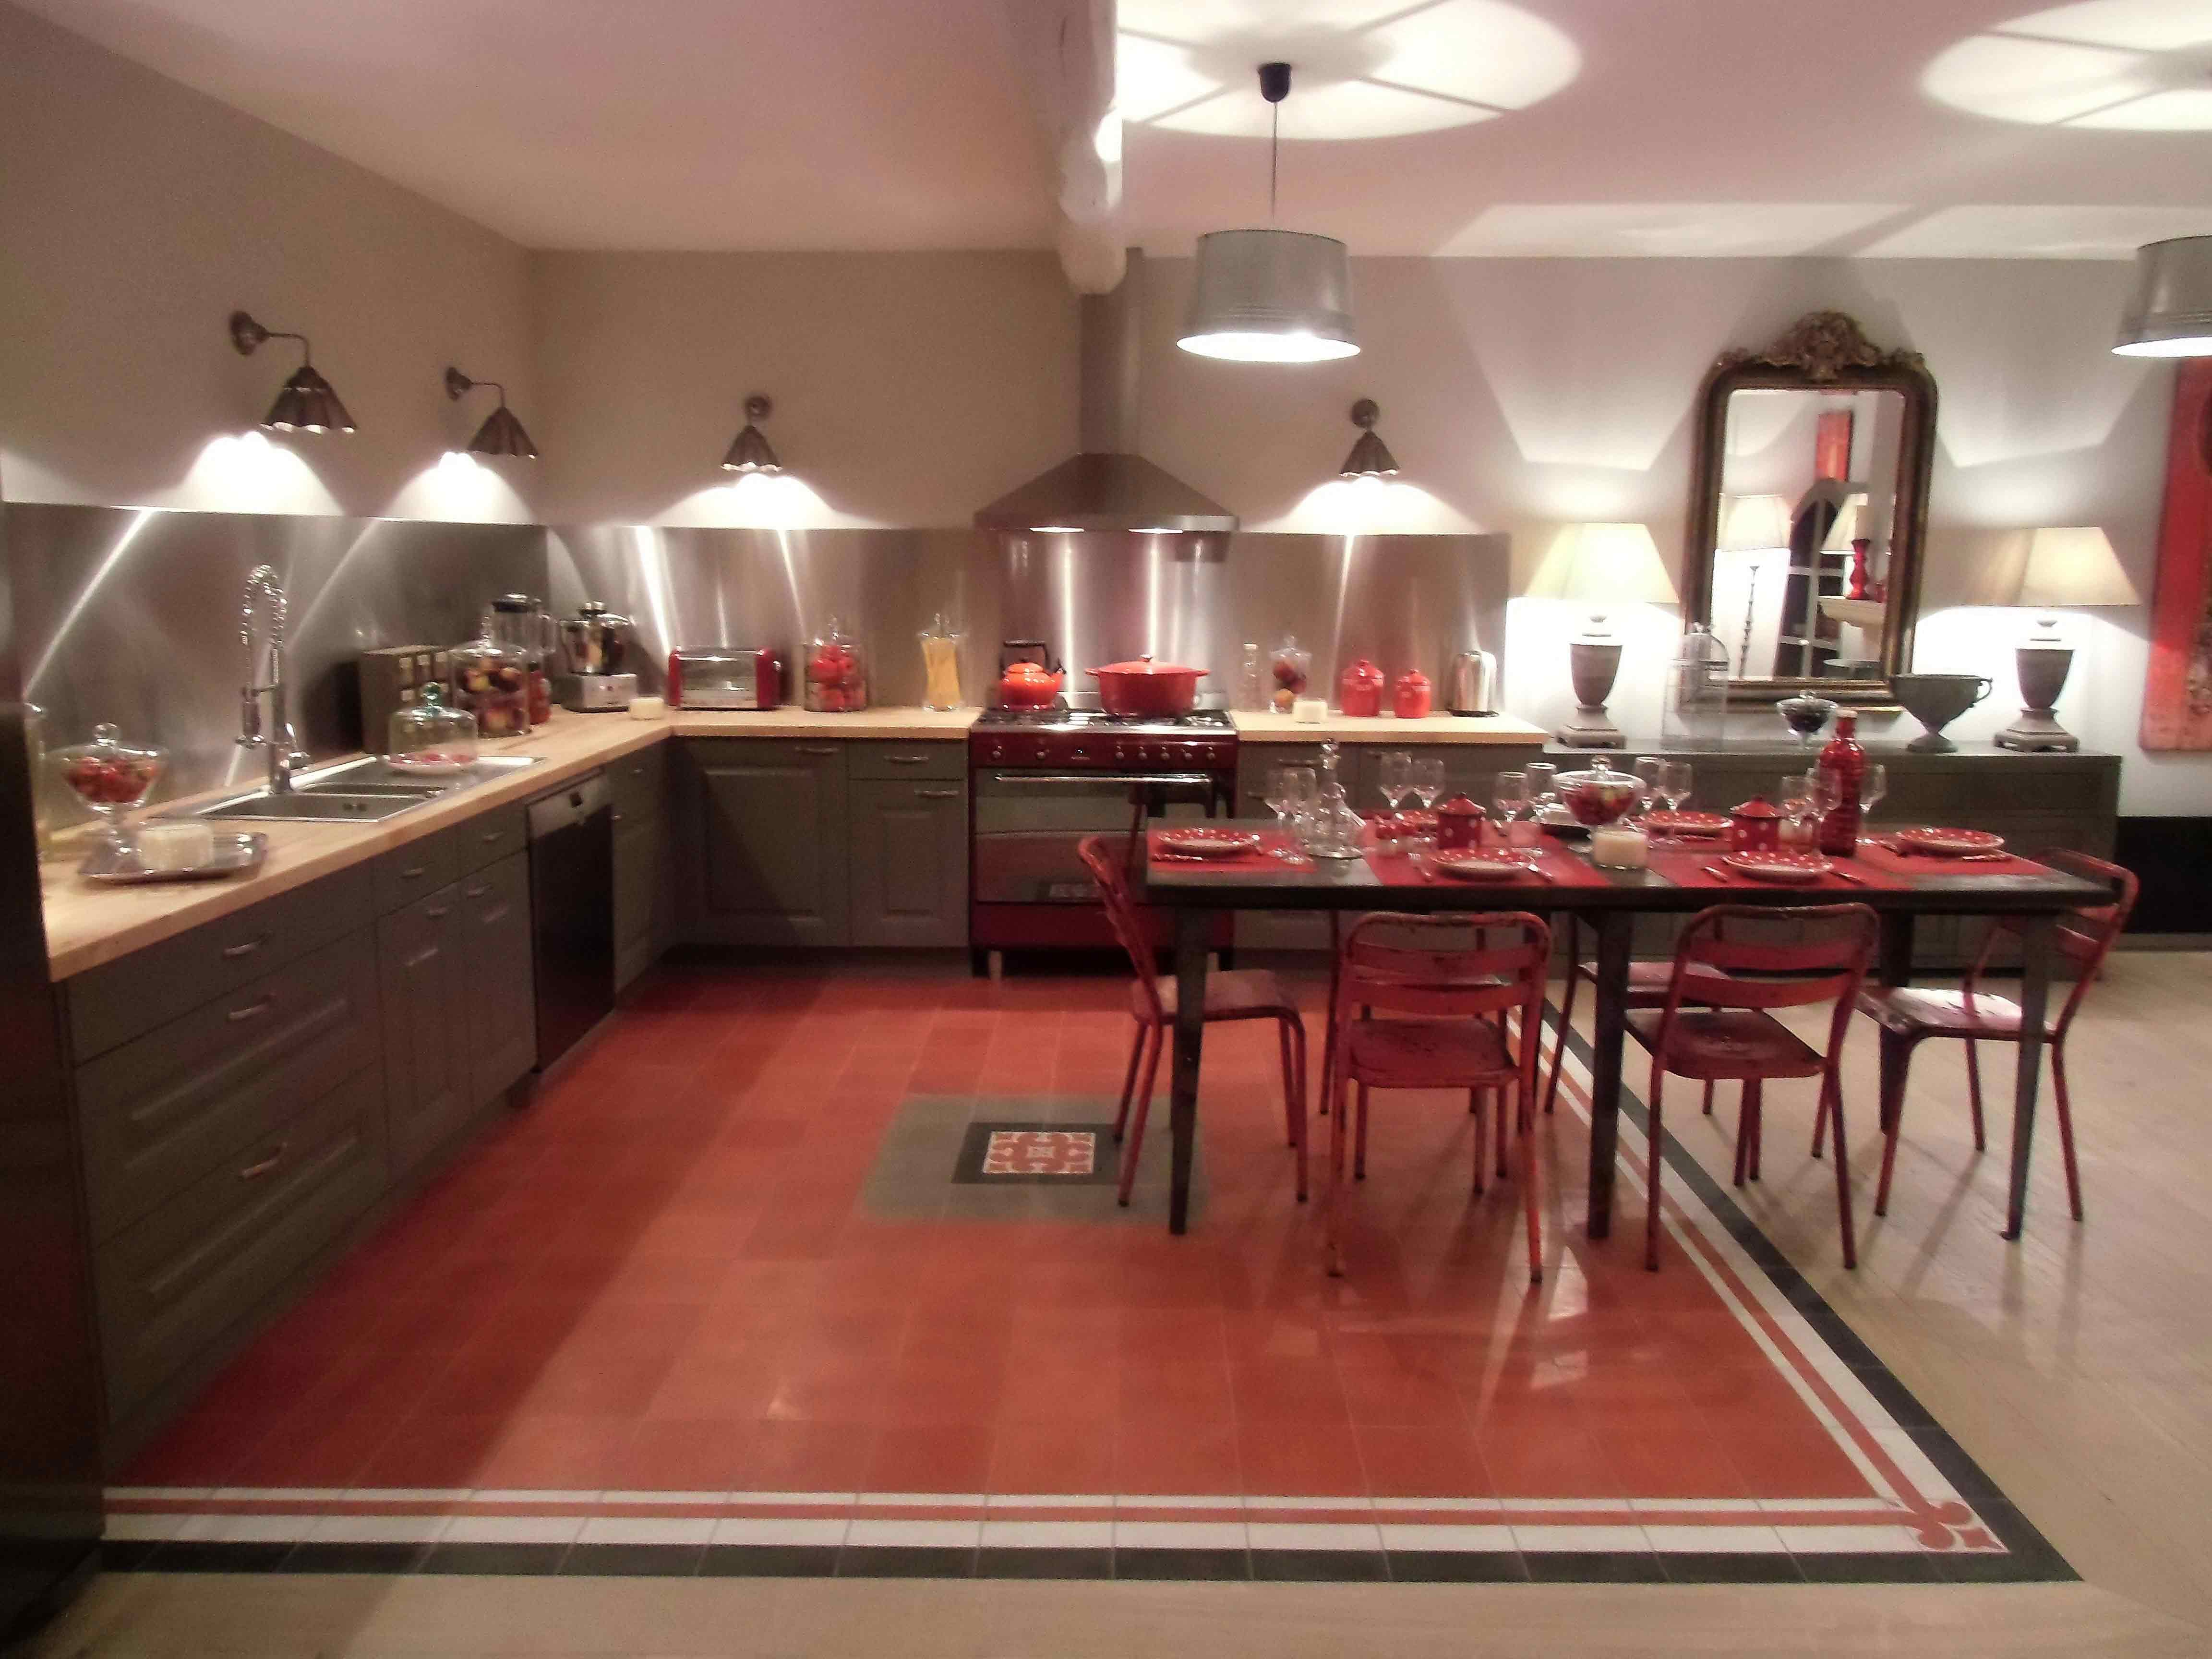 Credence cuisine m6 deco cr dences cuisine - Credence decorative cuisine ...